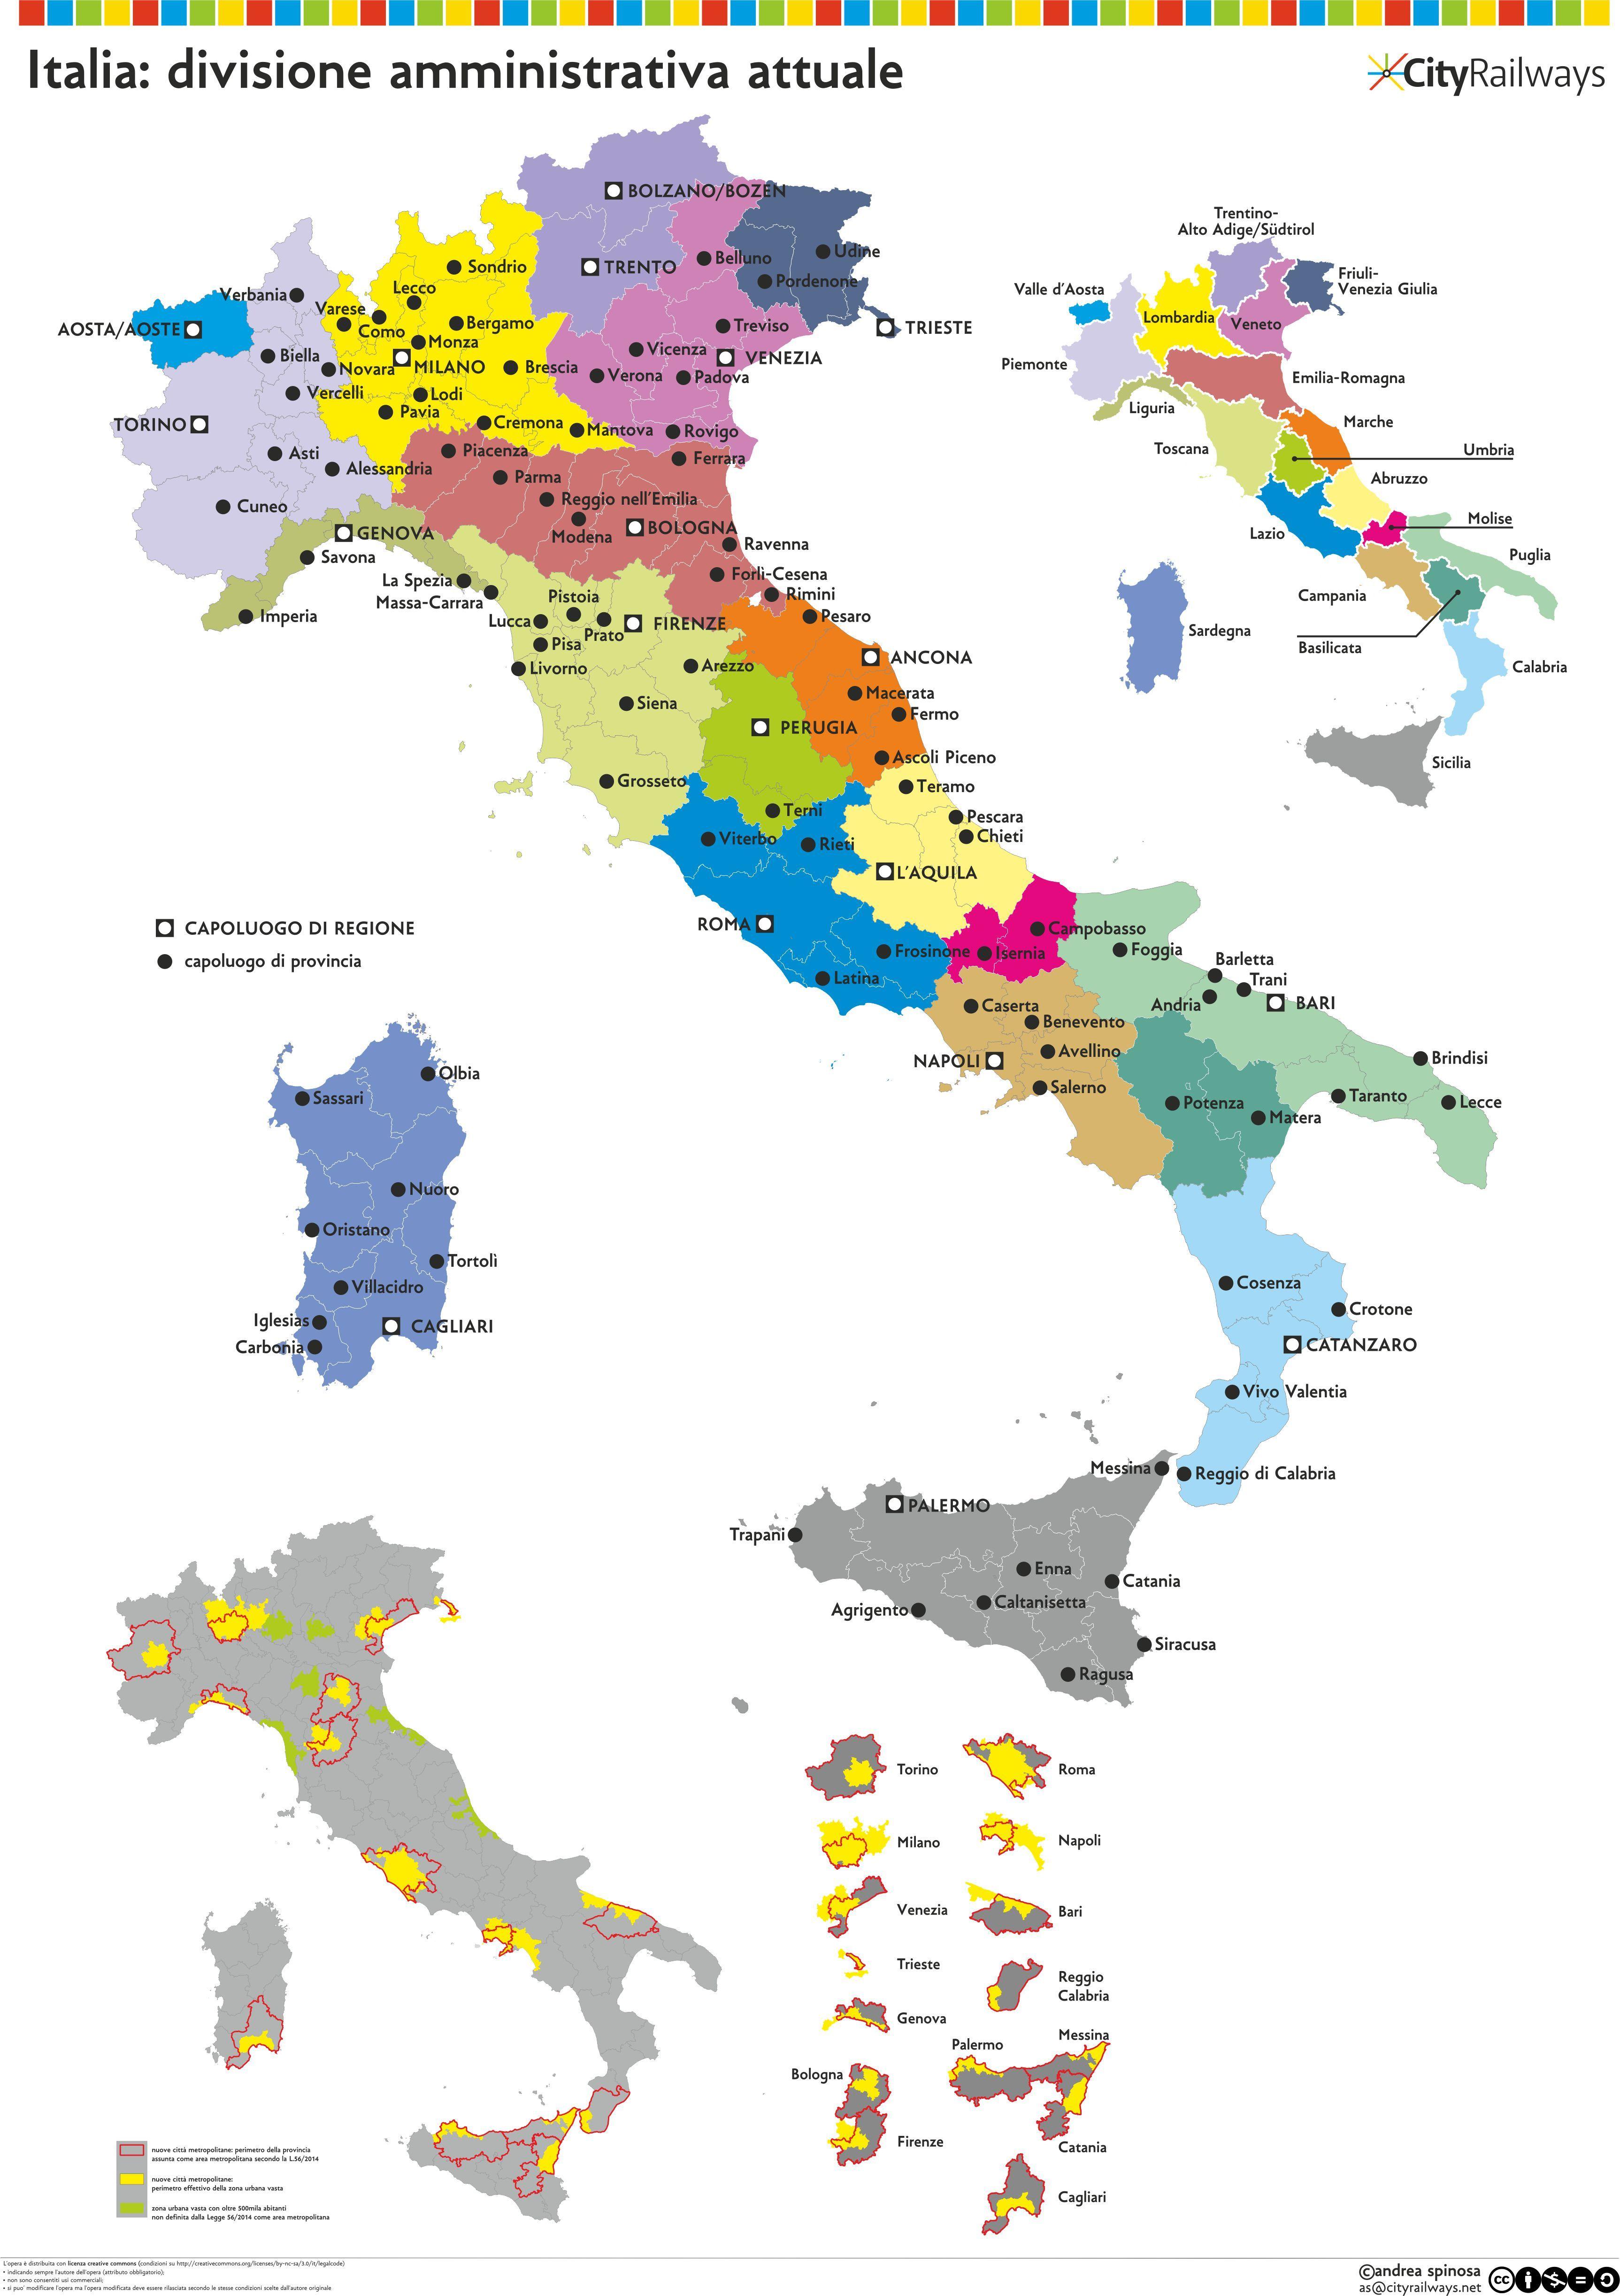 Italys Atlas proposal of an optimization of the current